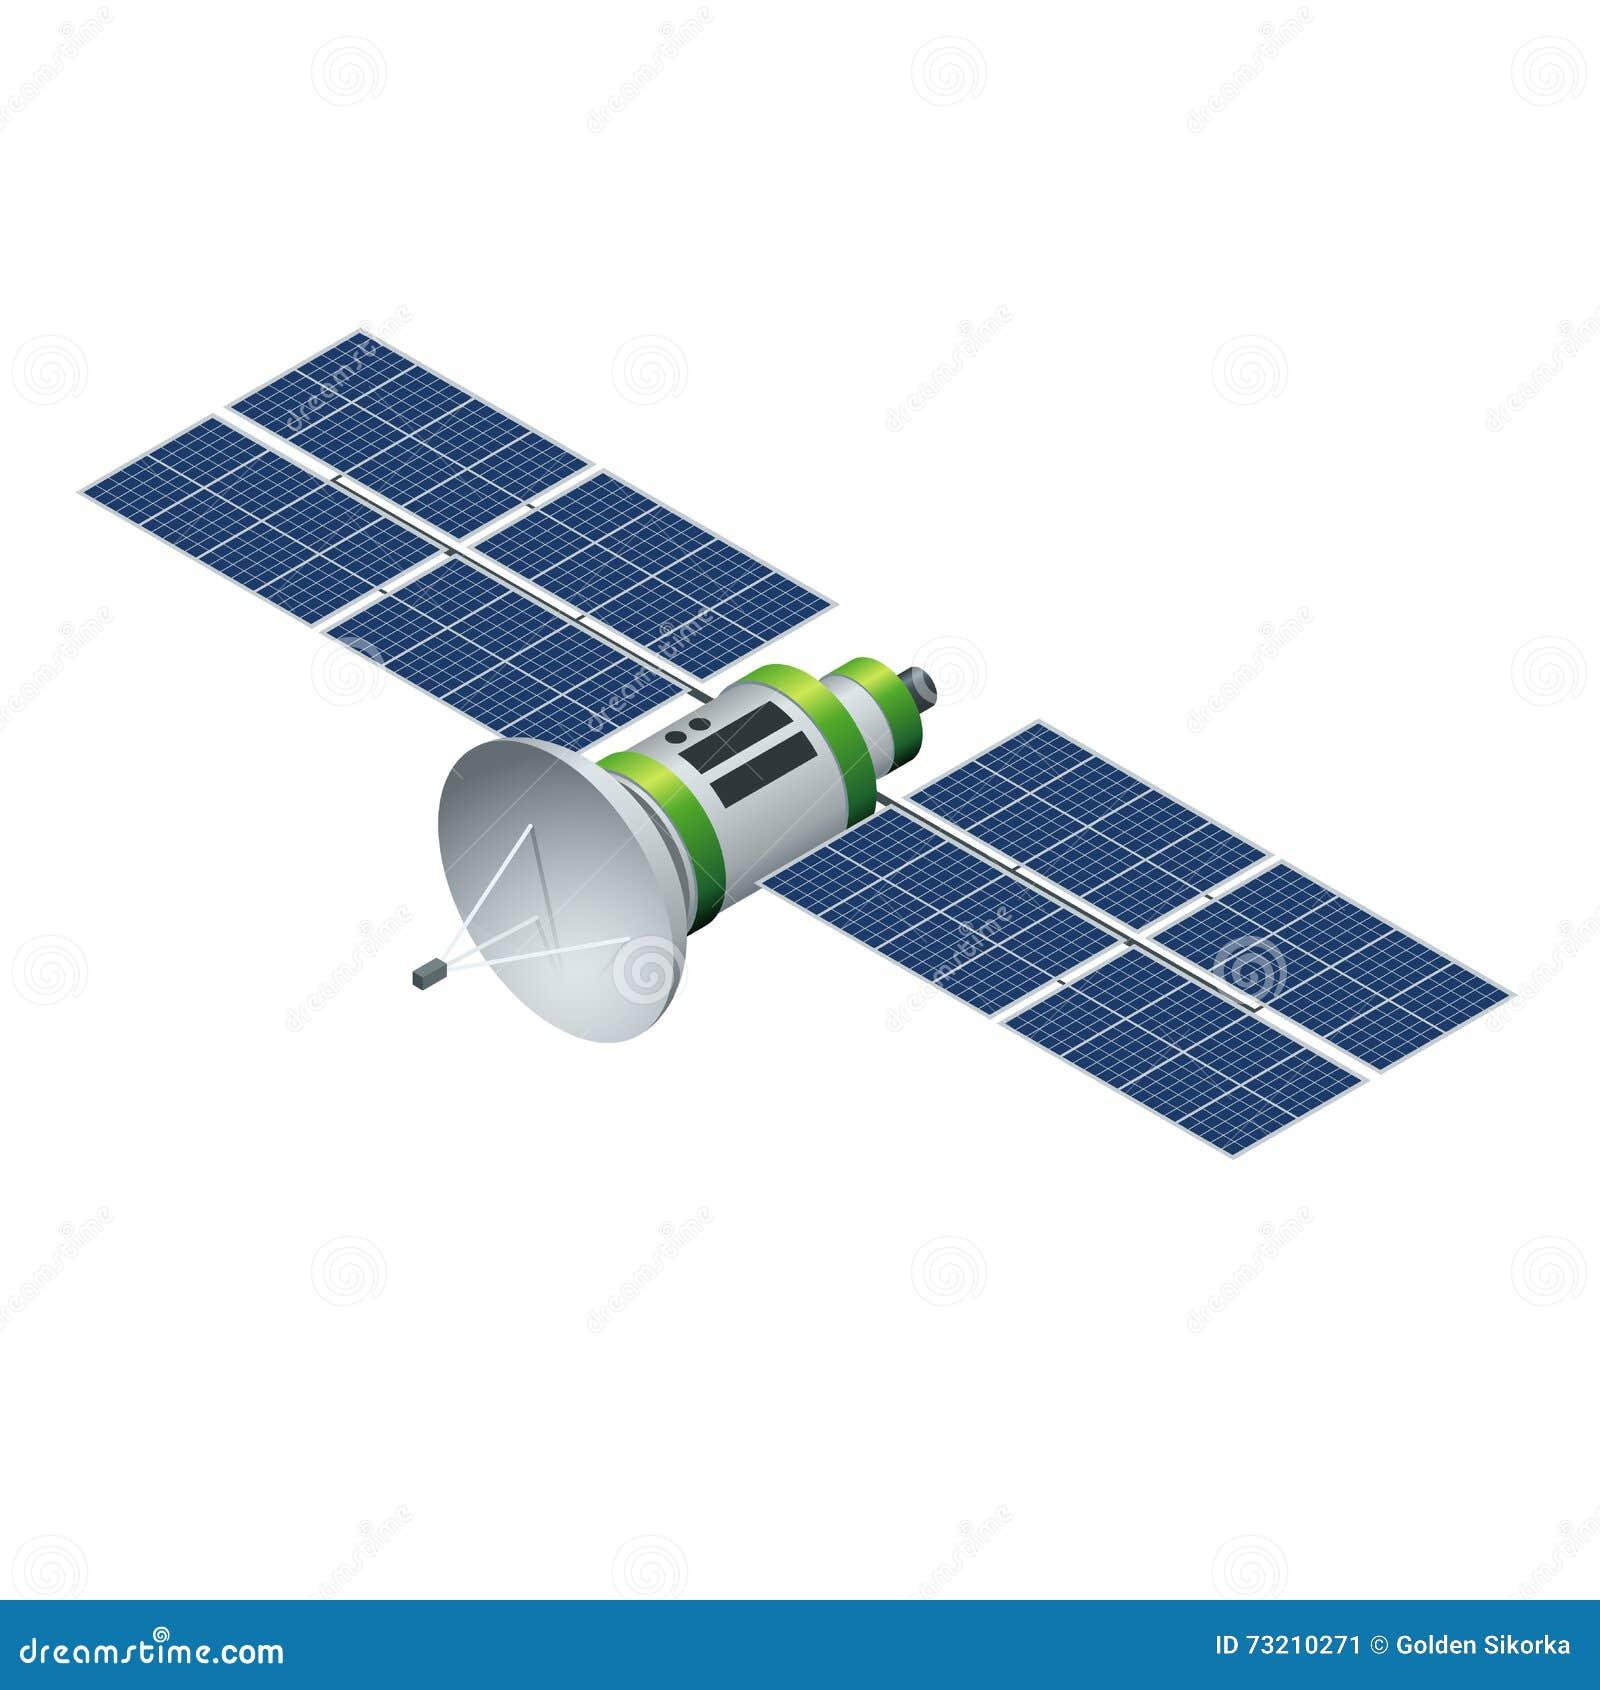 Satellites, Non-Governmental High Resolution